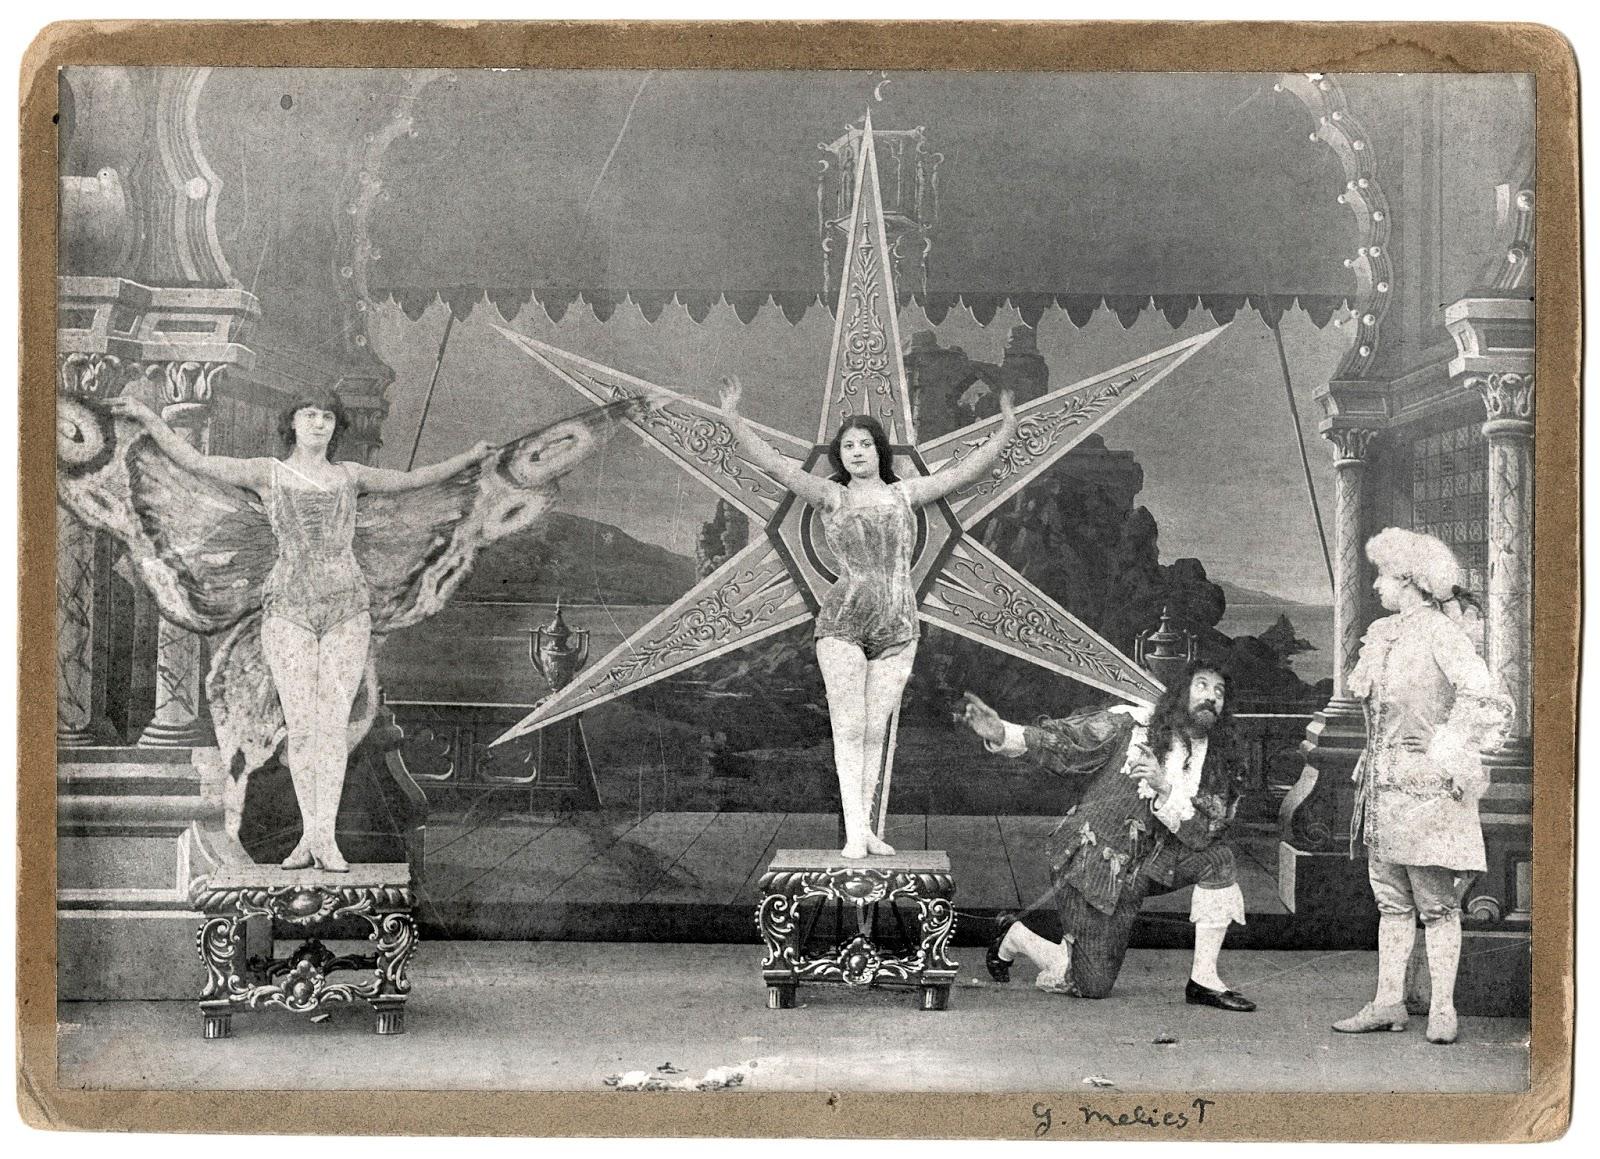 i-le-papillon-fantastique-i-la-mariposa-fantastica-1909-copy-la-cinematheque-francaise-foto-stephane-dabrowski